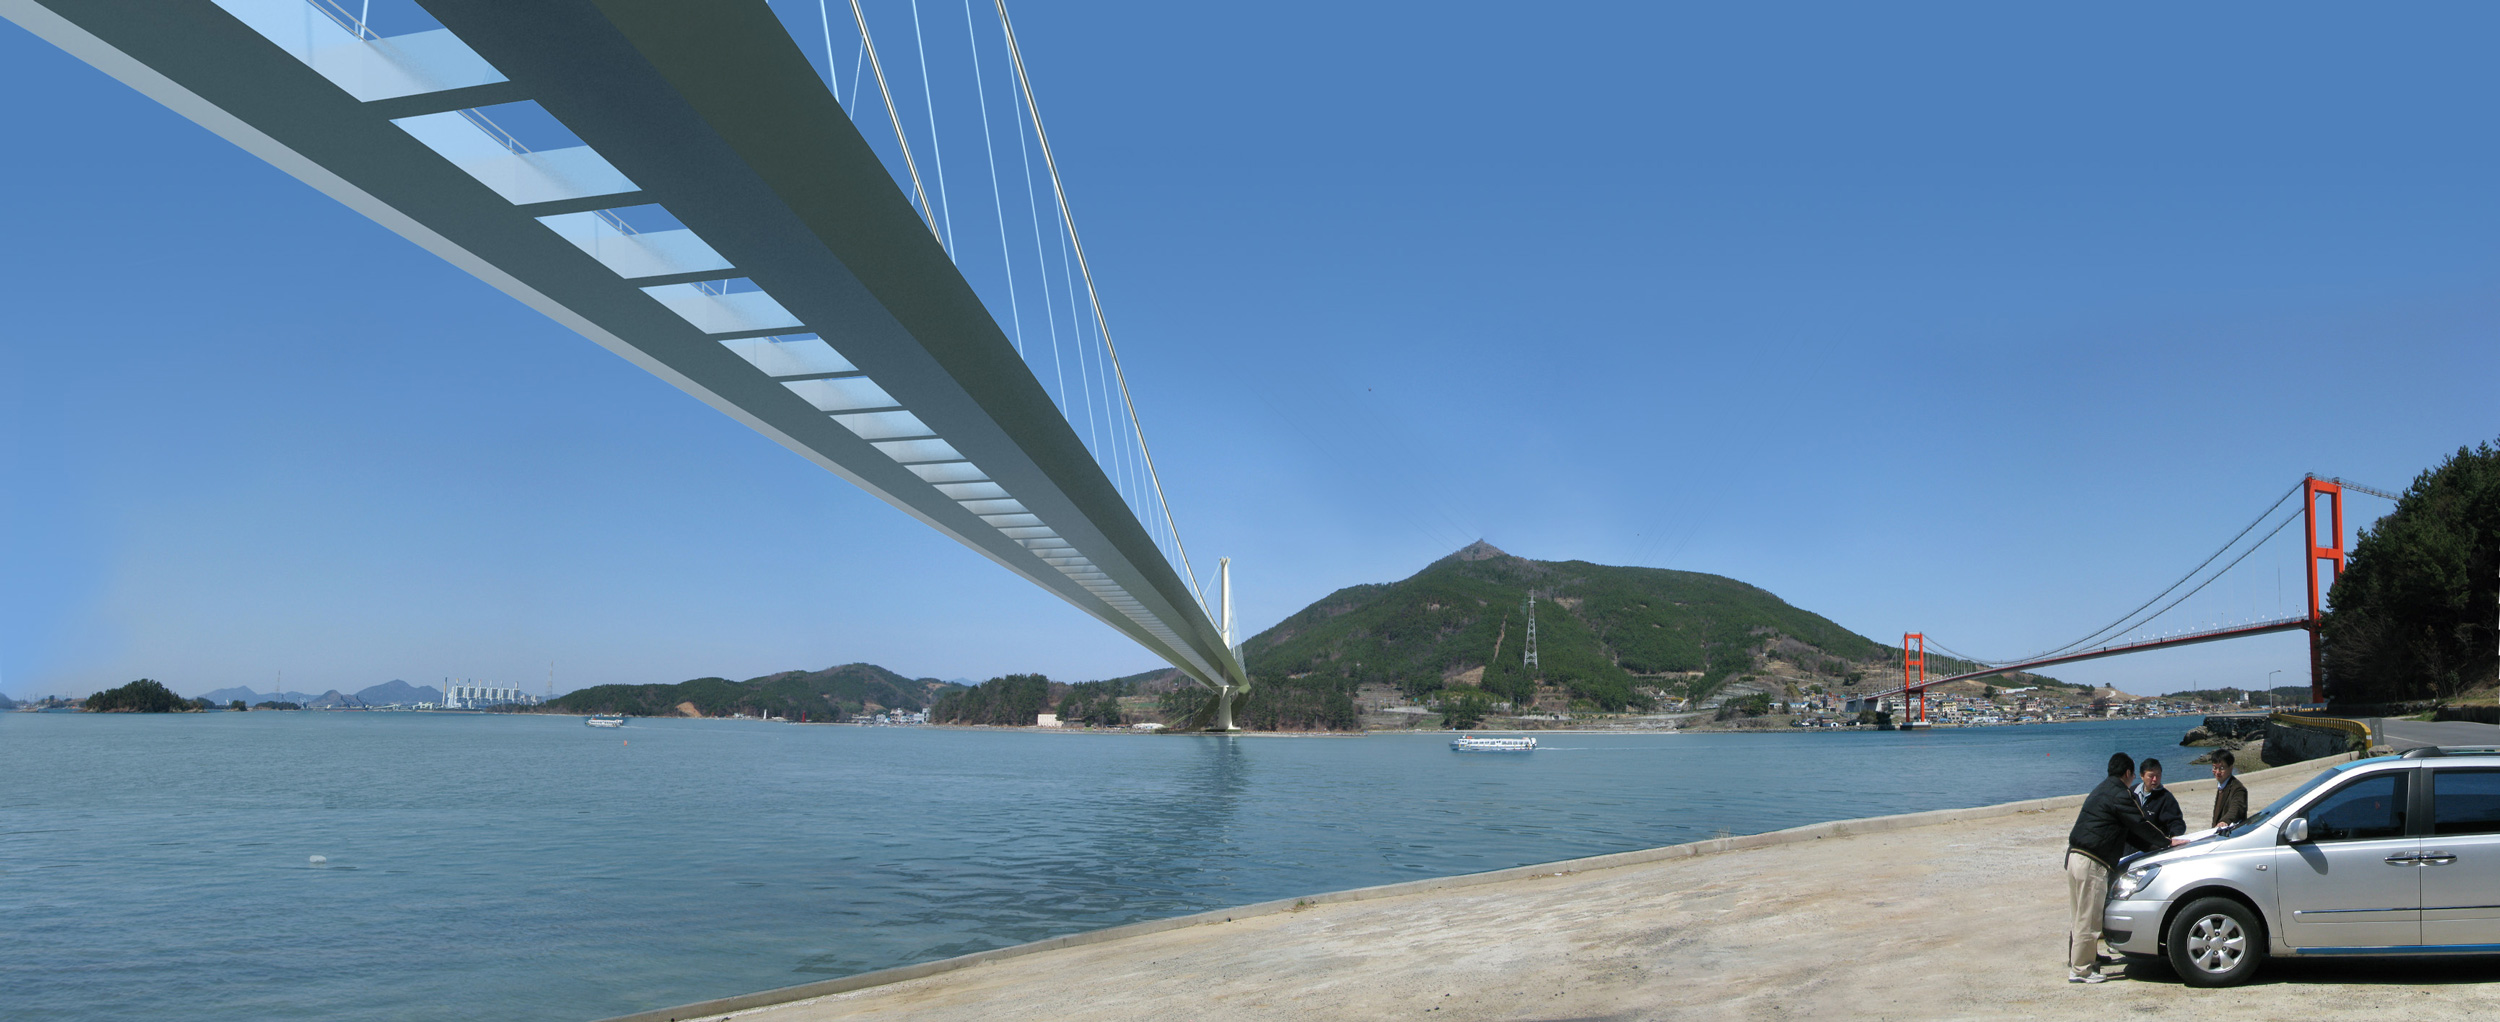 location-13---bridge.jpg